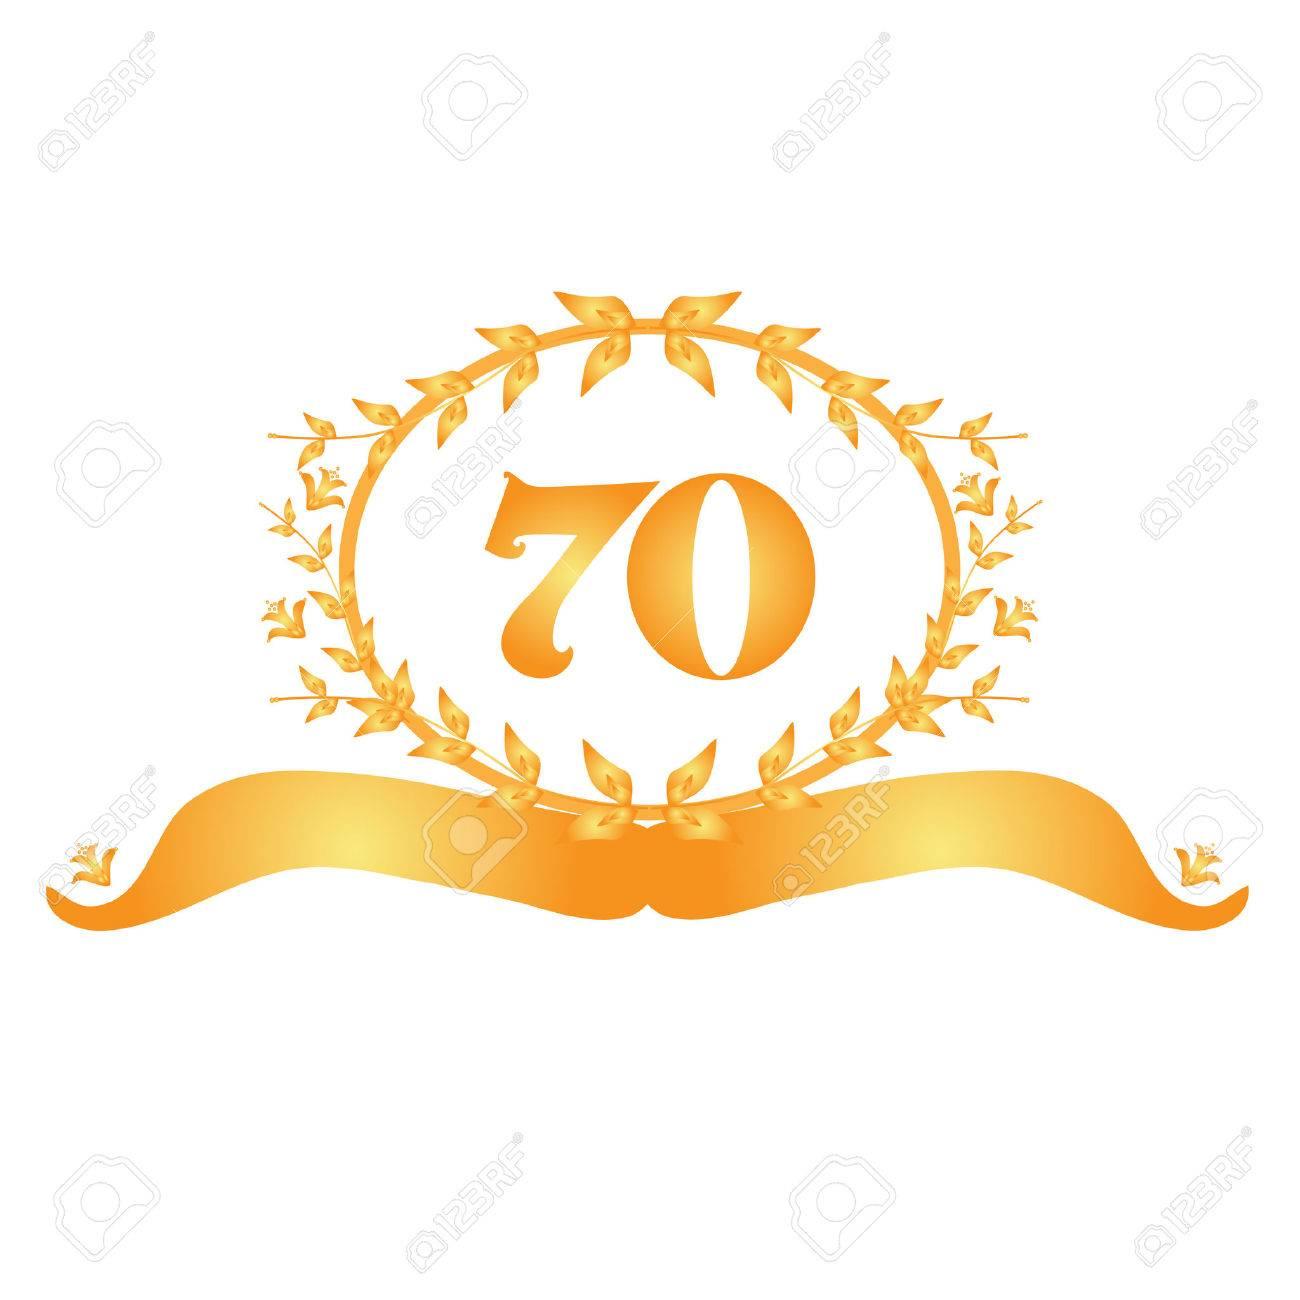 70th anniversary golden floral banner.